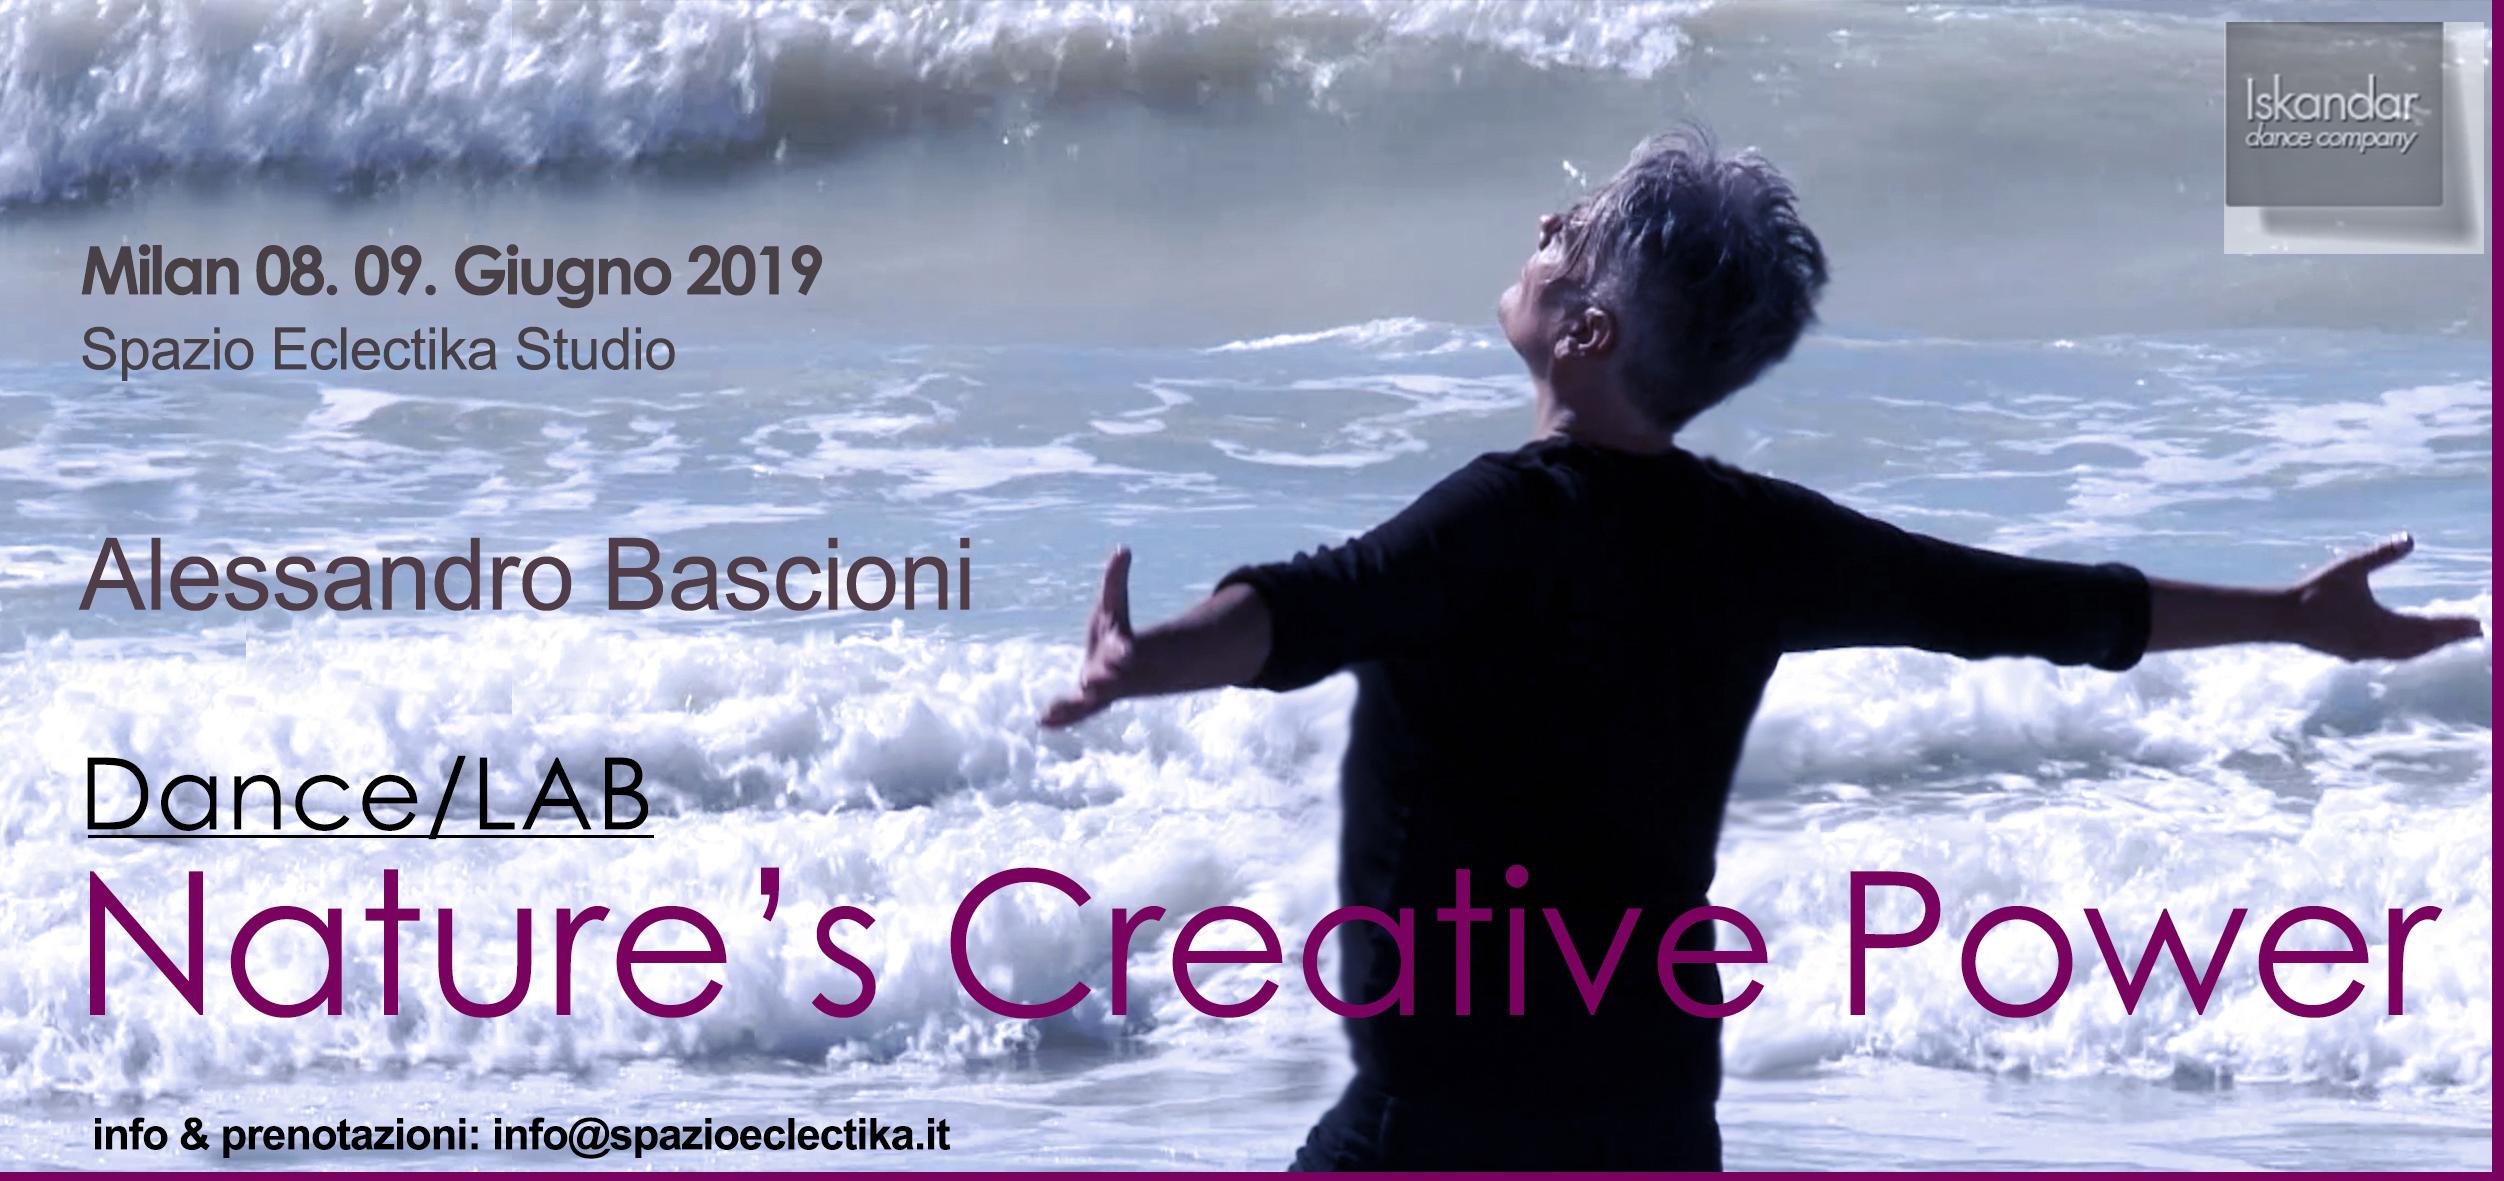 Dance/LAb Nature's Creative Power, Alessandro Bascioni